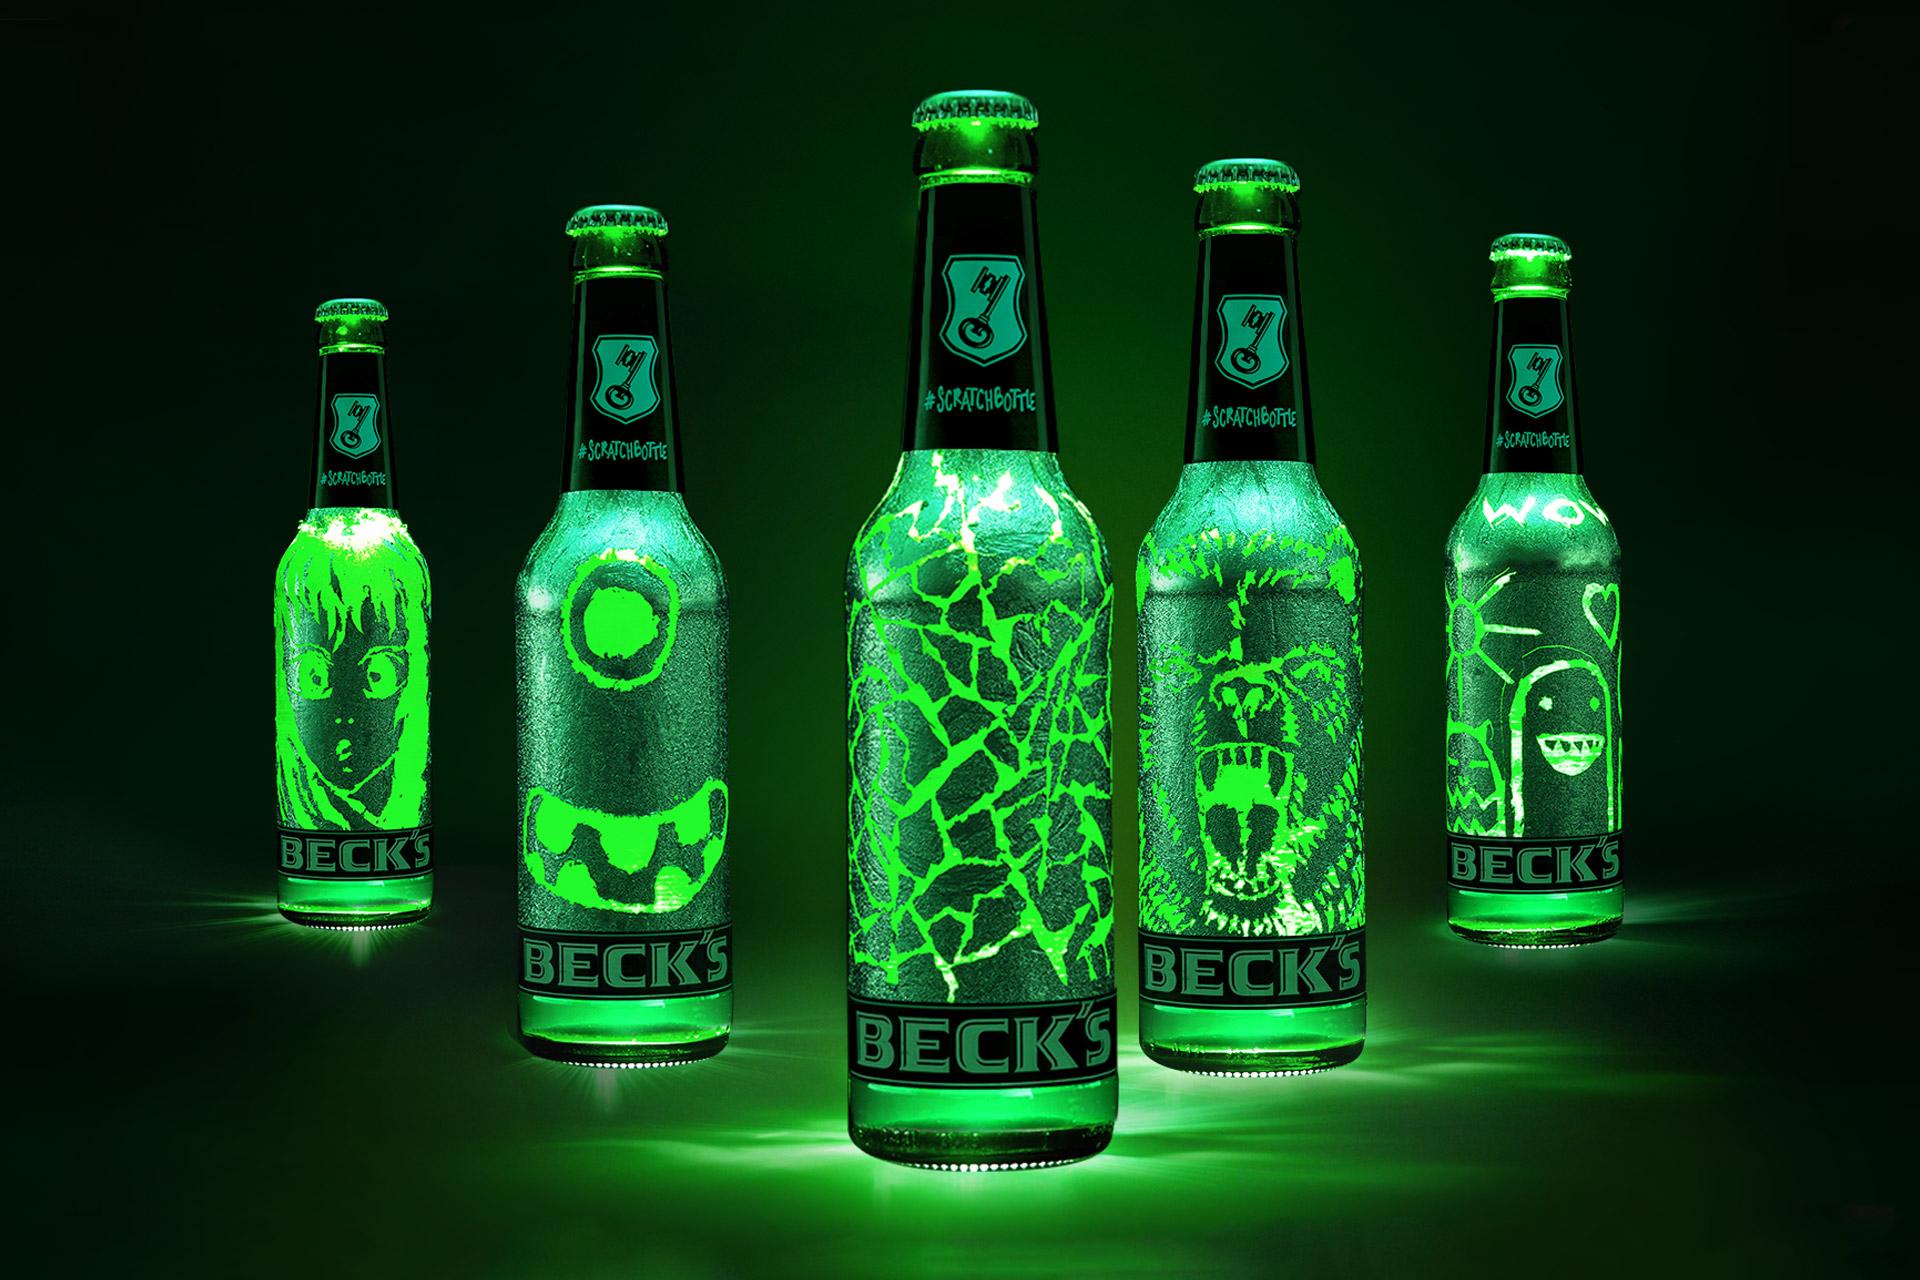 Becks_night_1280px.jpg